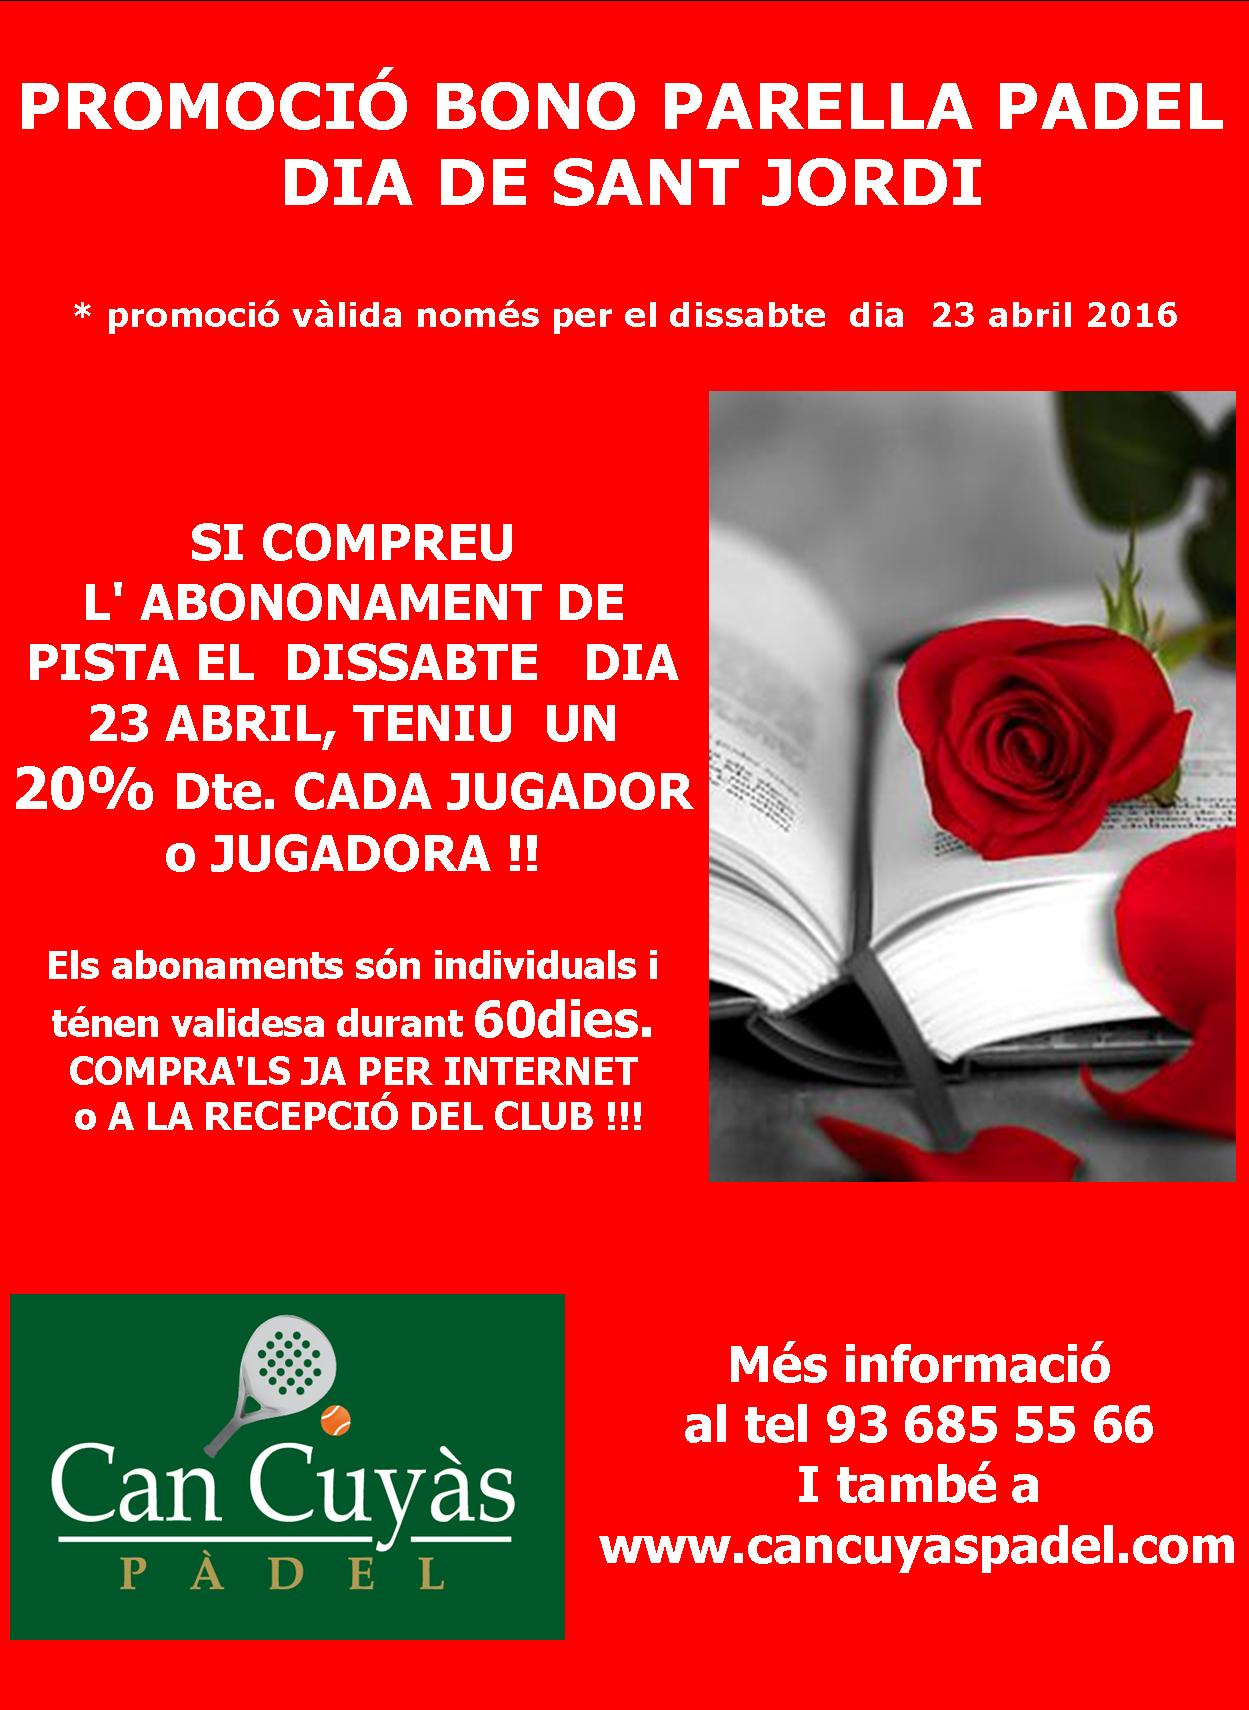 PROMO DIA SANT Jordi 2016